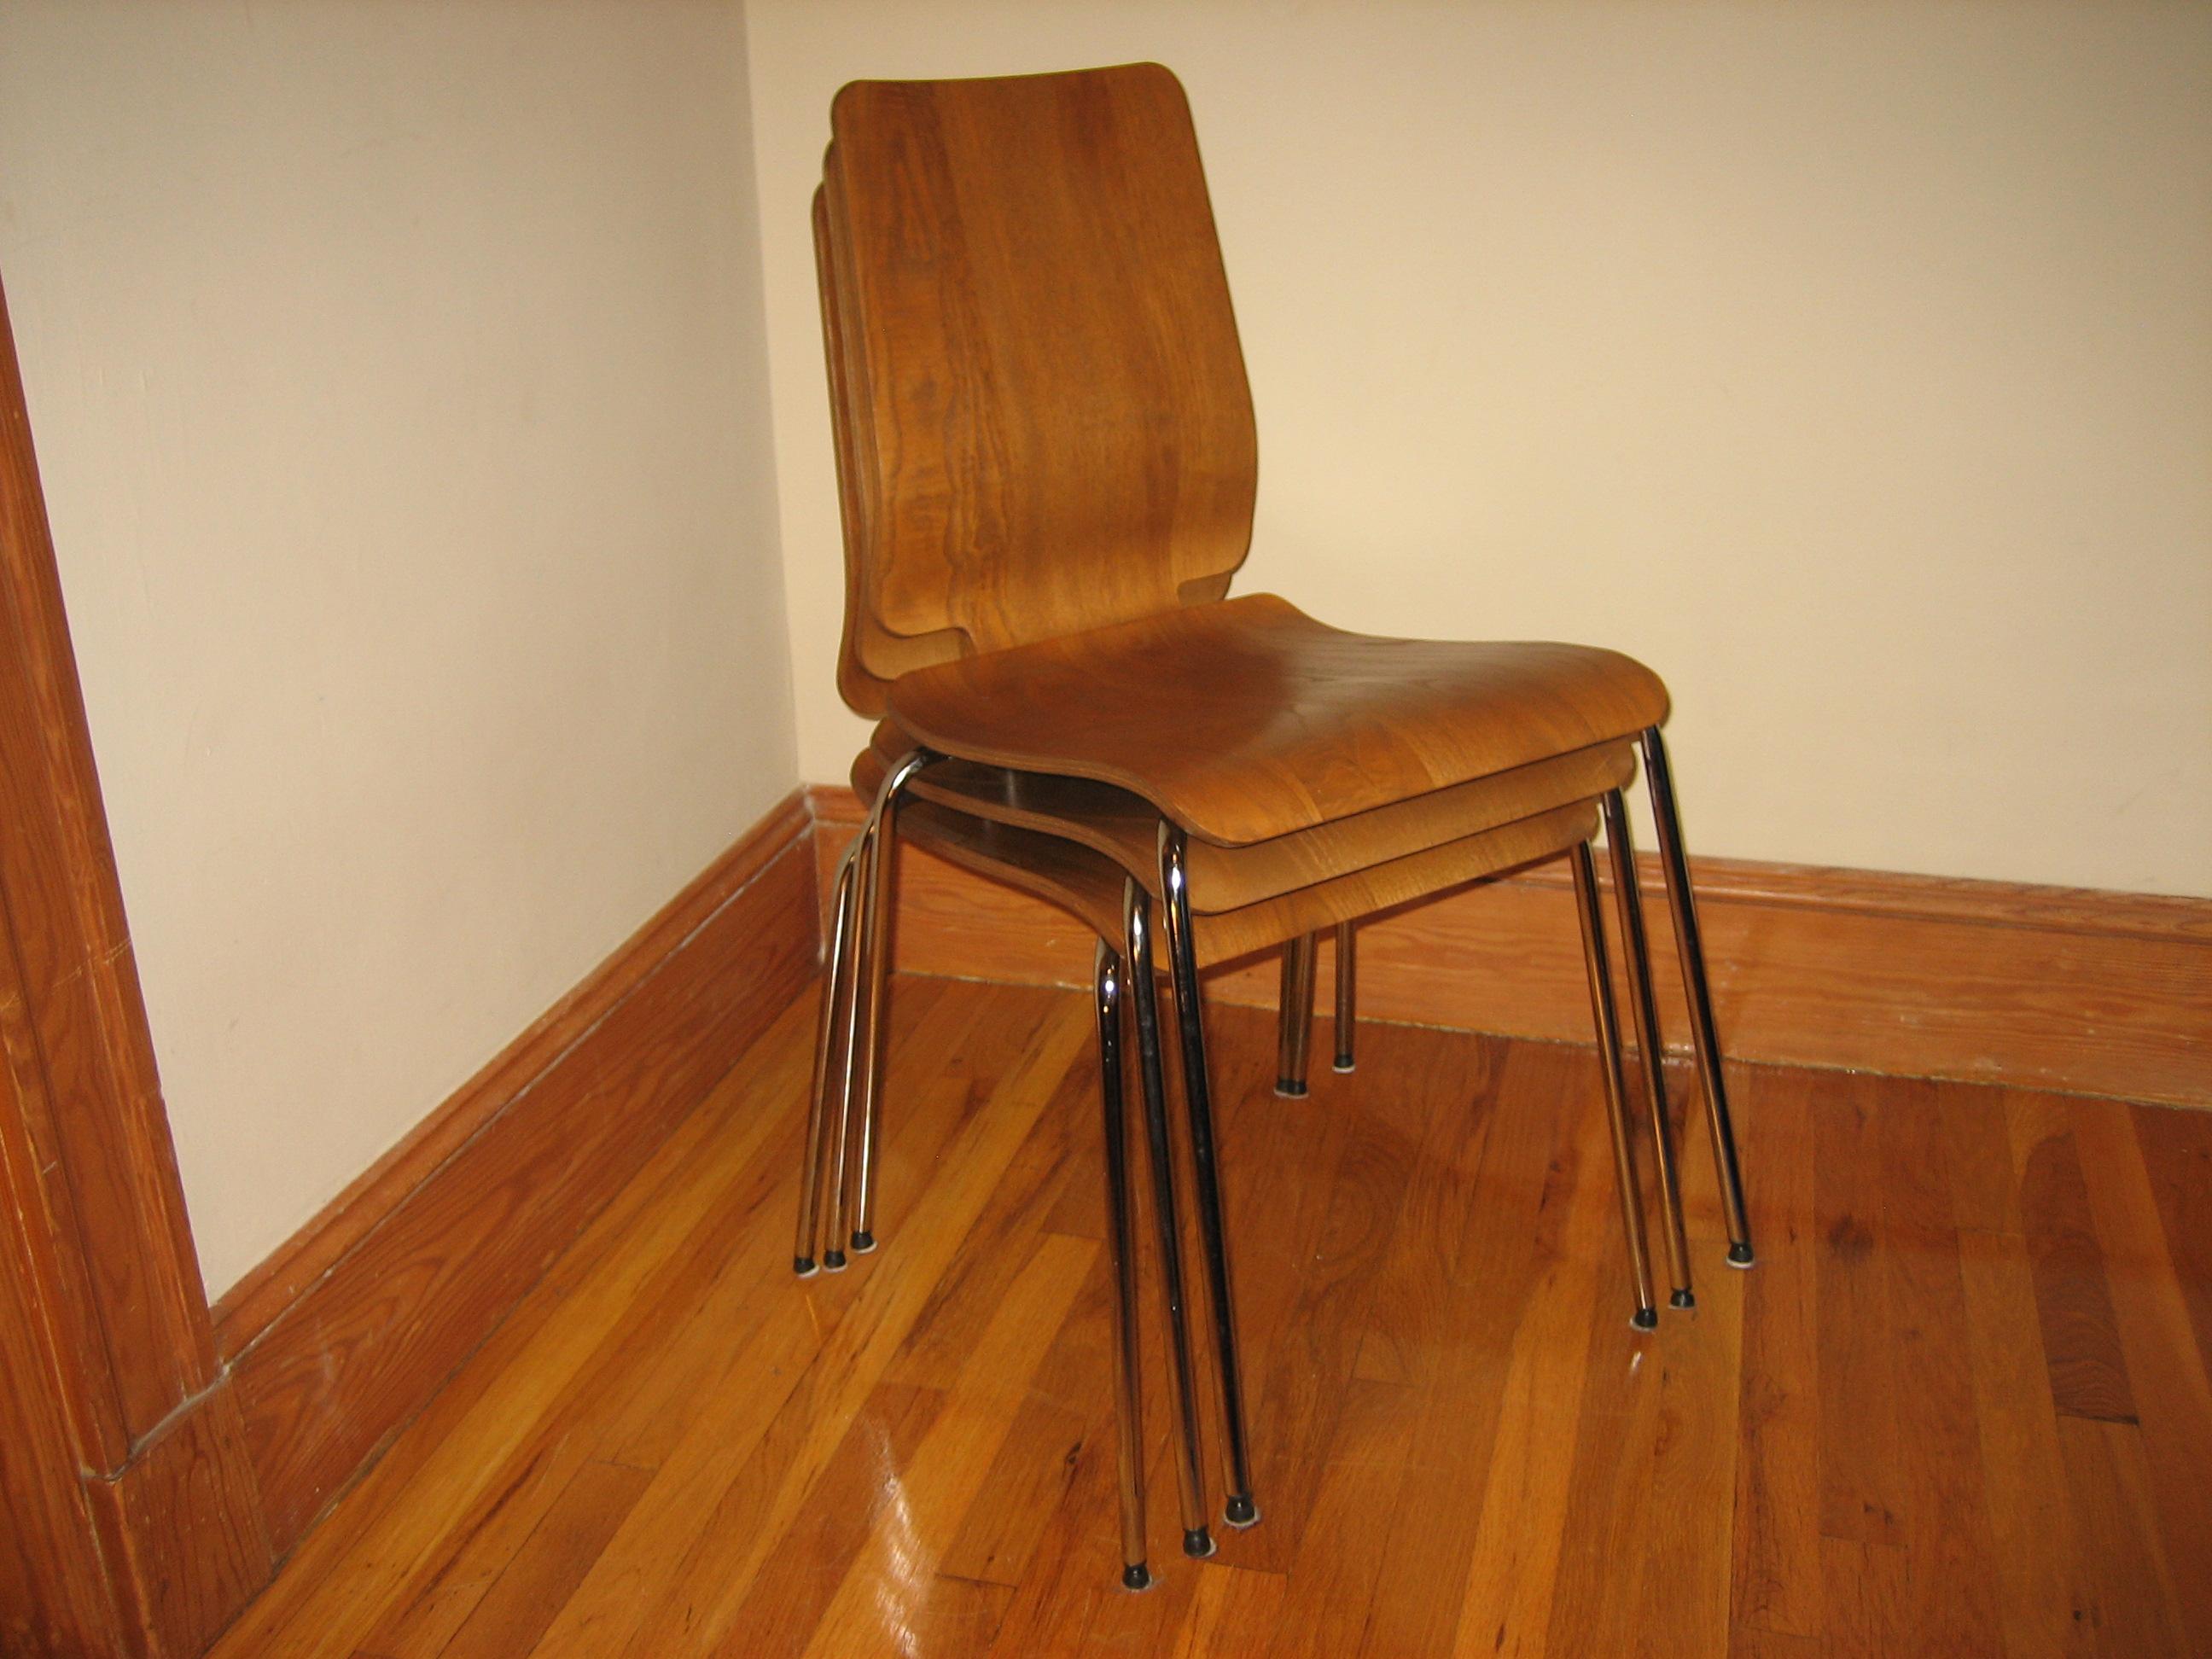 6 Ikea Gilbert Chairs